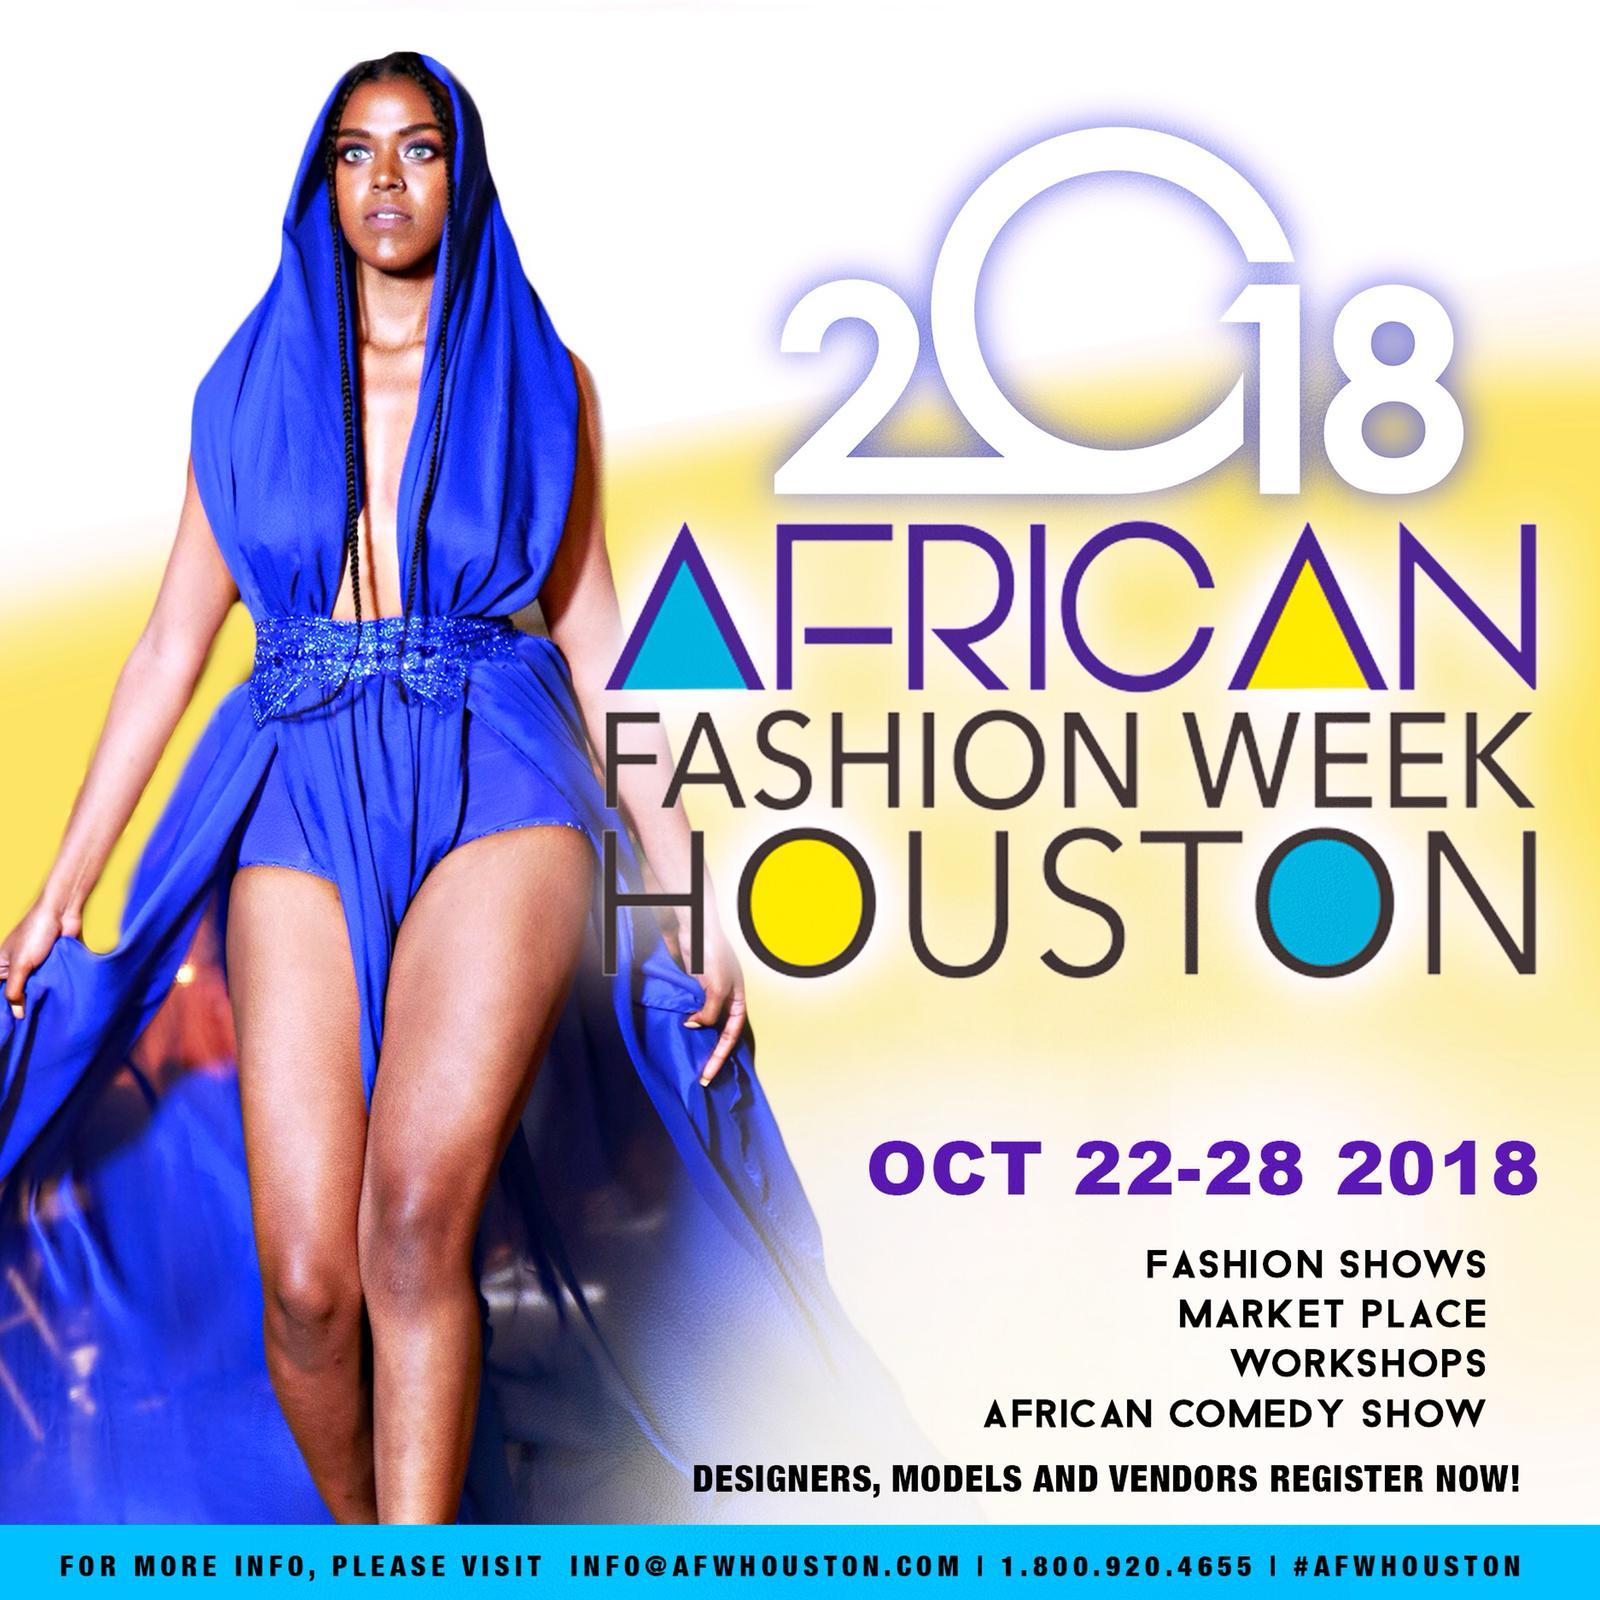 African American Fashion Show: Msada's Blog